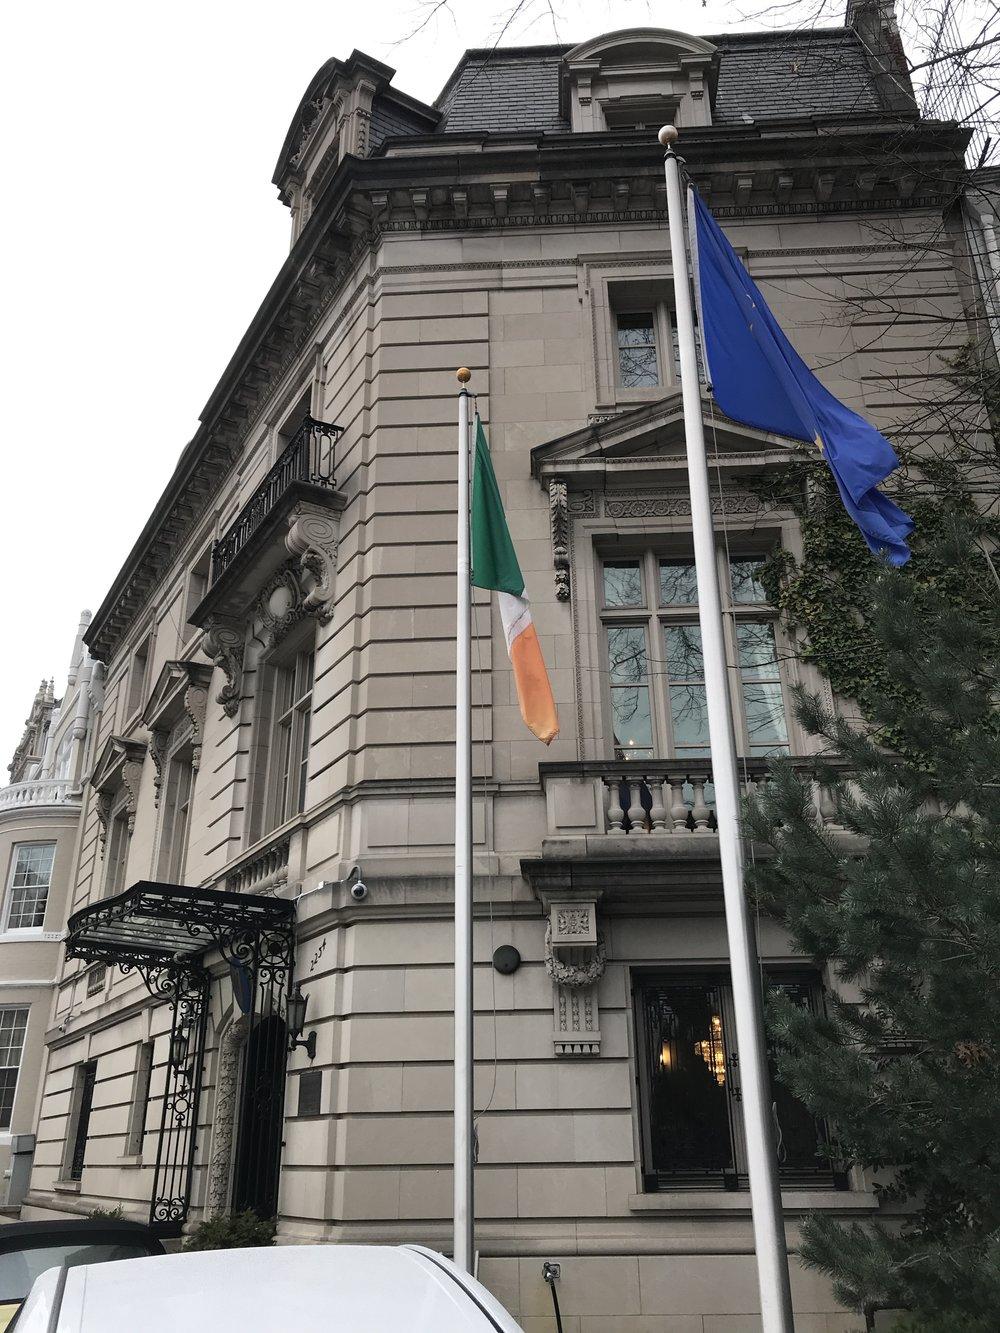 The Embassy of Ireland.